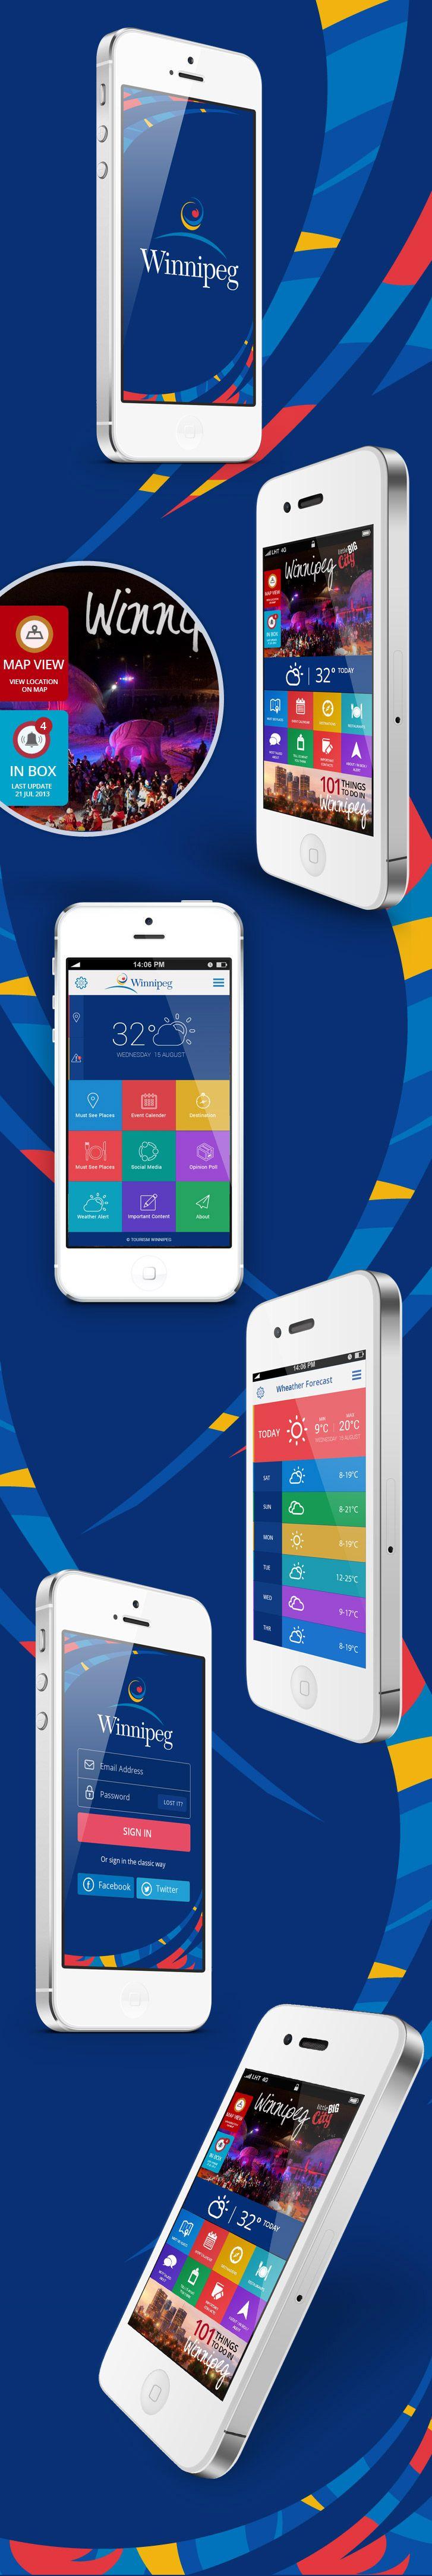 Winnipeg mobile app design